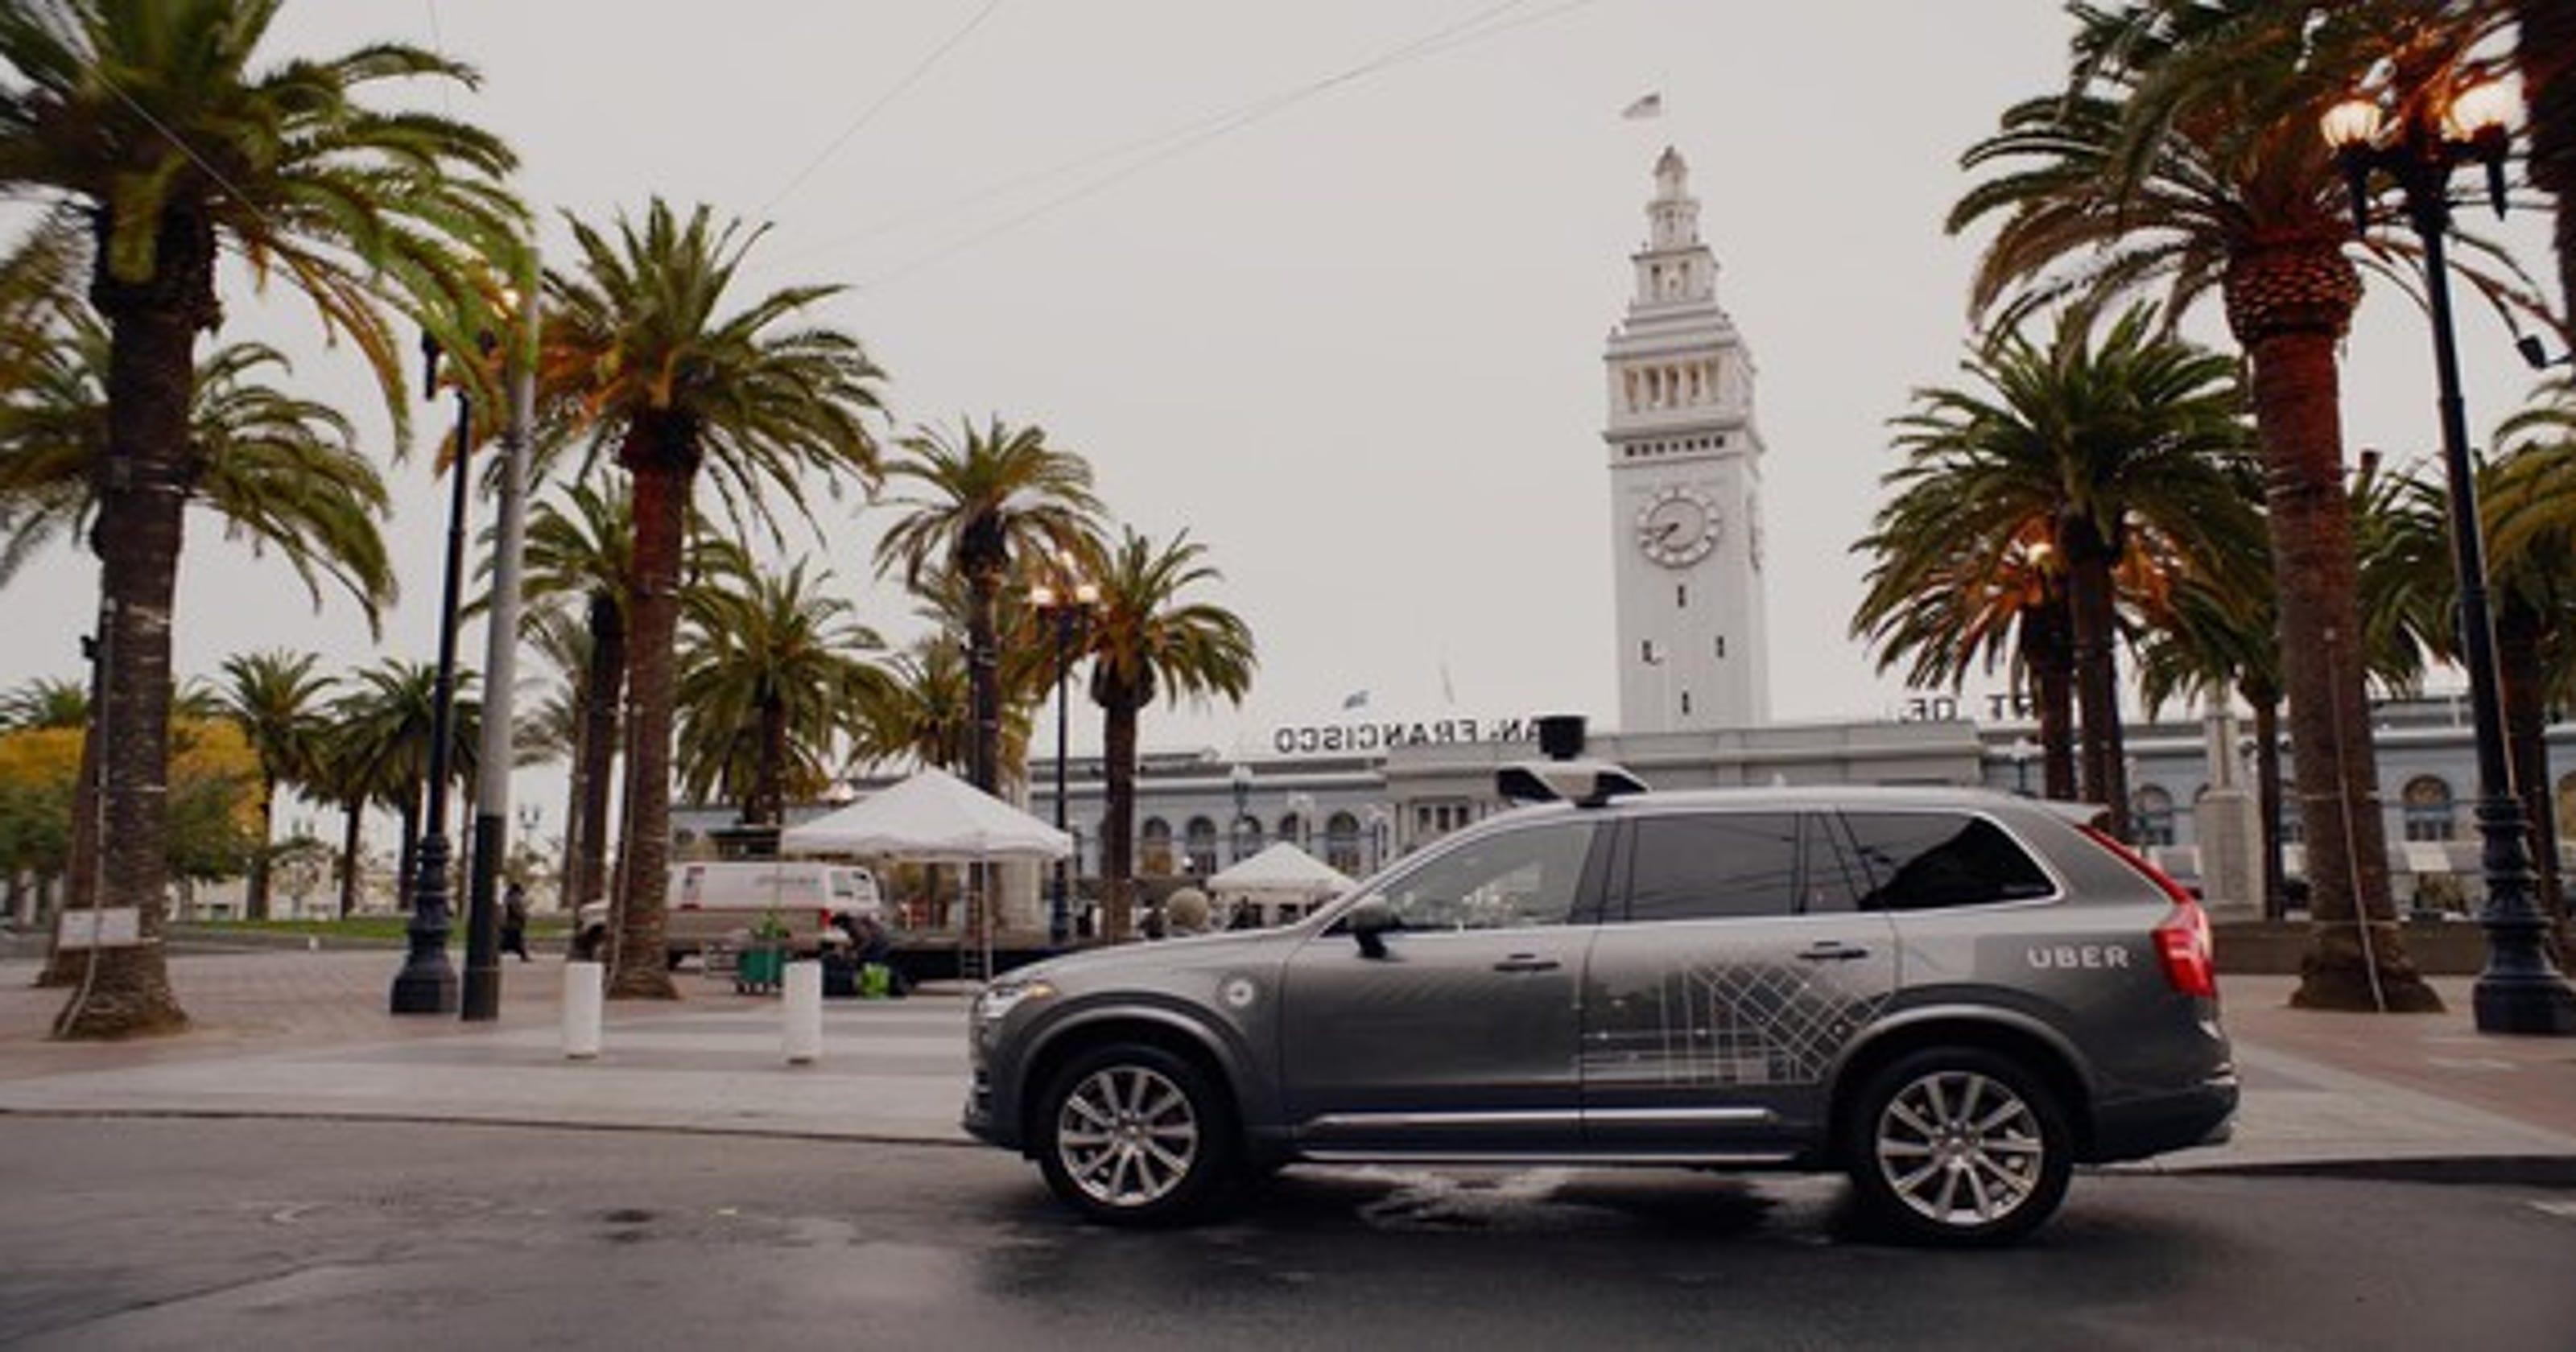 Uber self-driving car kills Arizona pedestrian, realizing